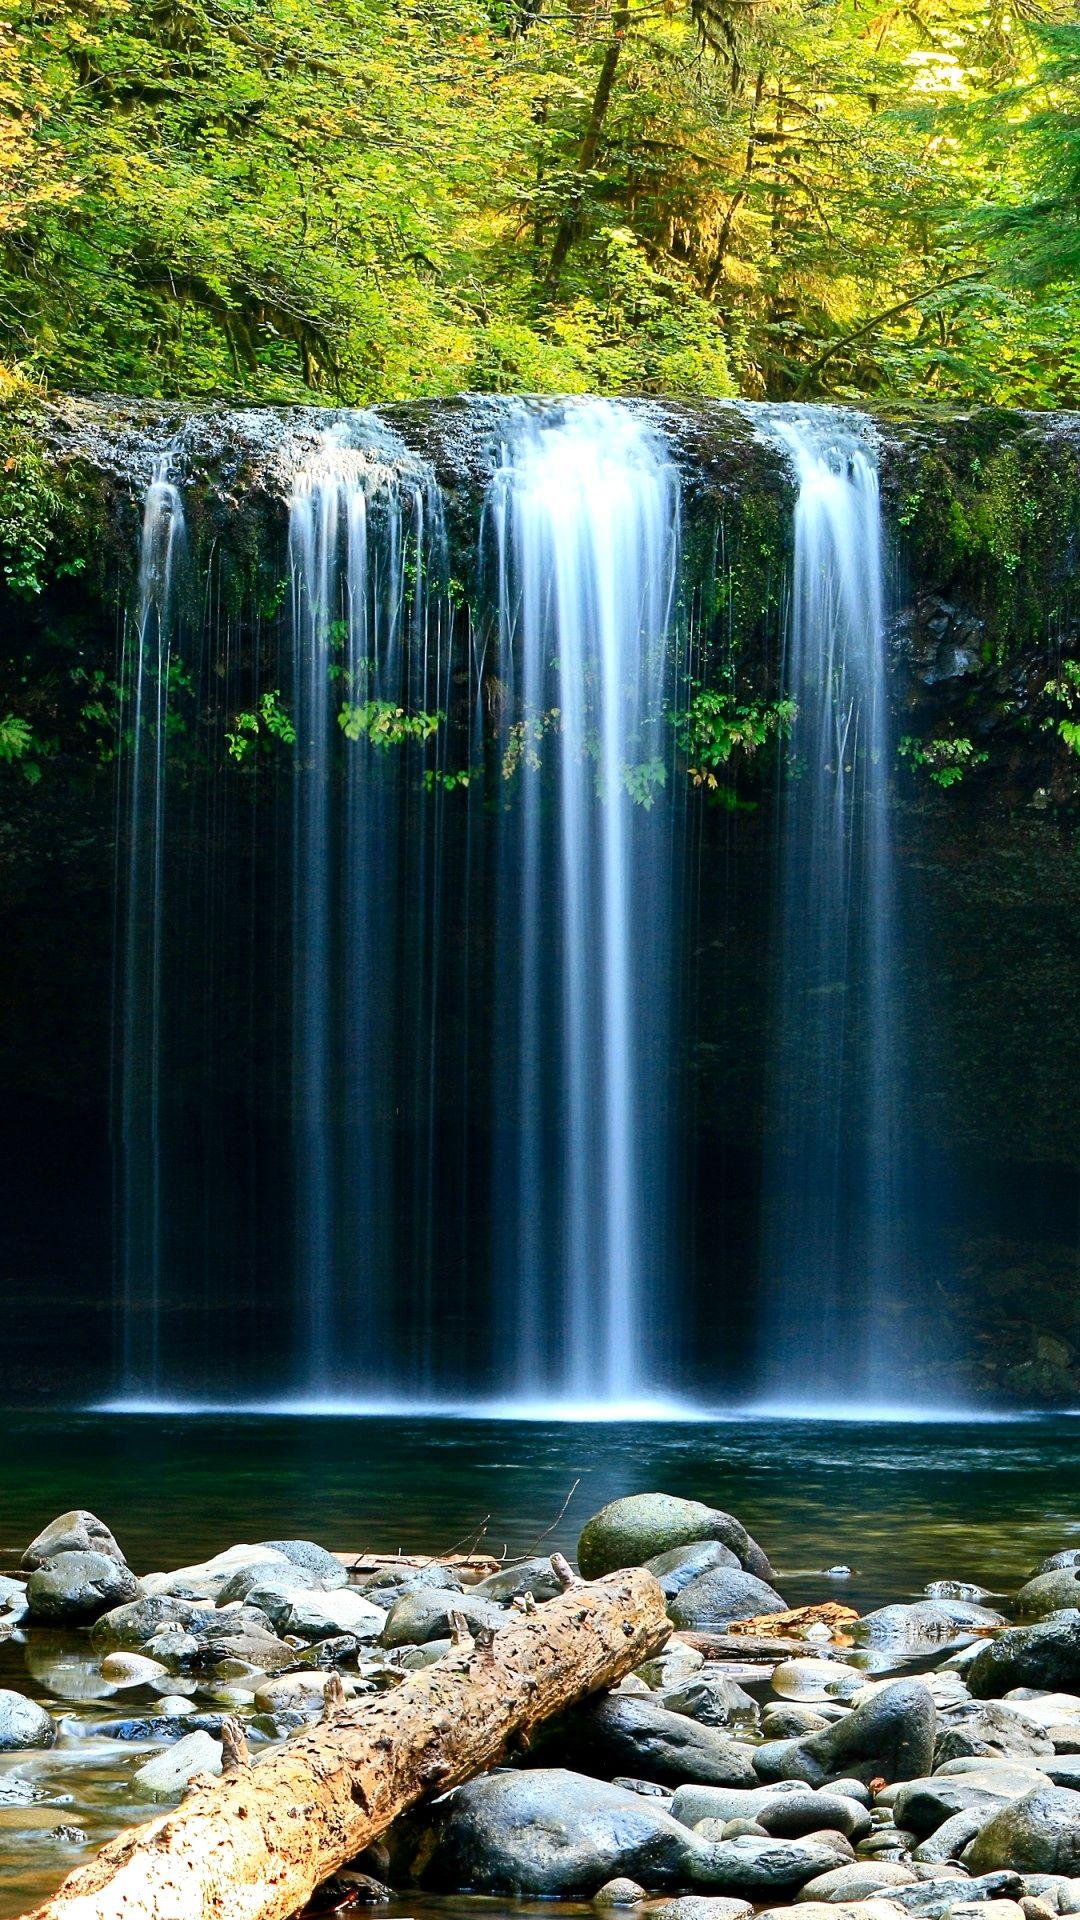 4k Wallpaper Nature Waterfall Ideas Waterfall Waterfall Photography Green Nature Wallpaper